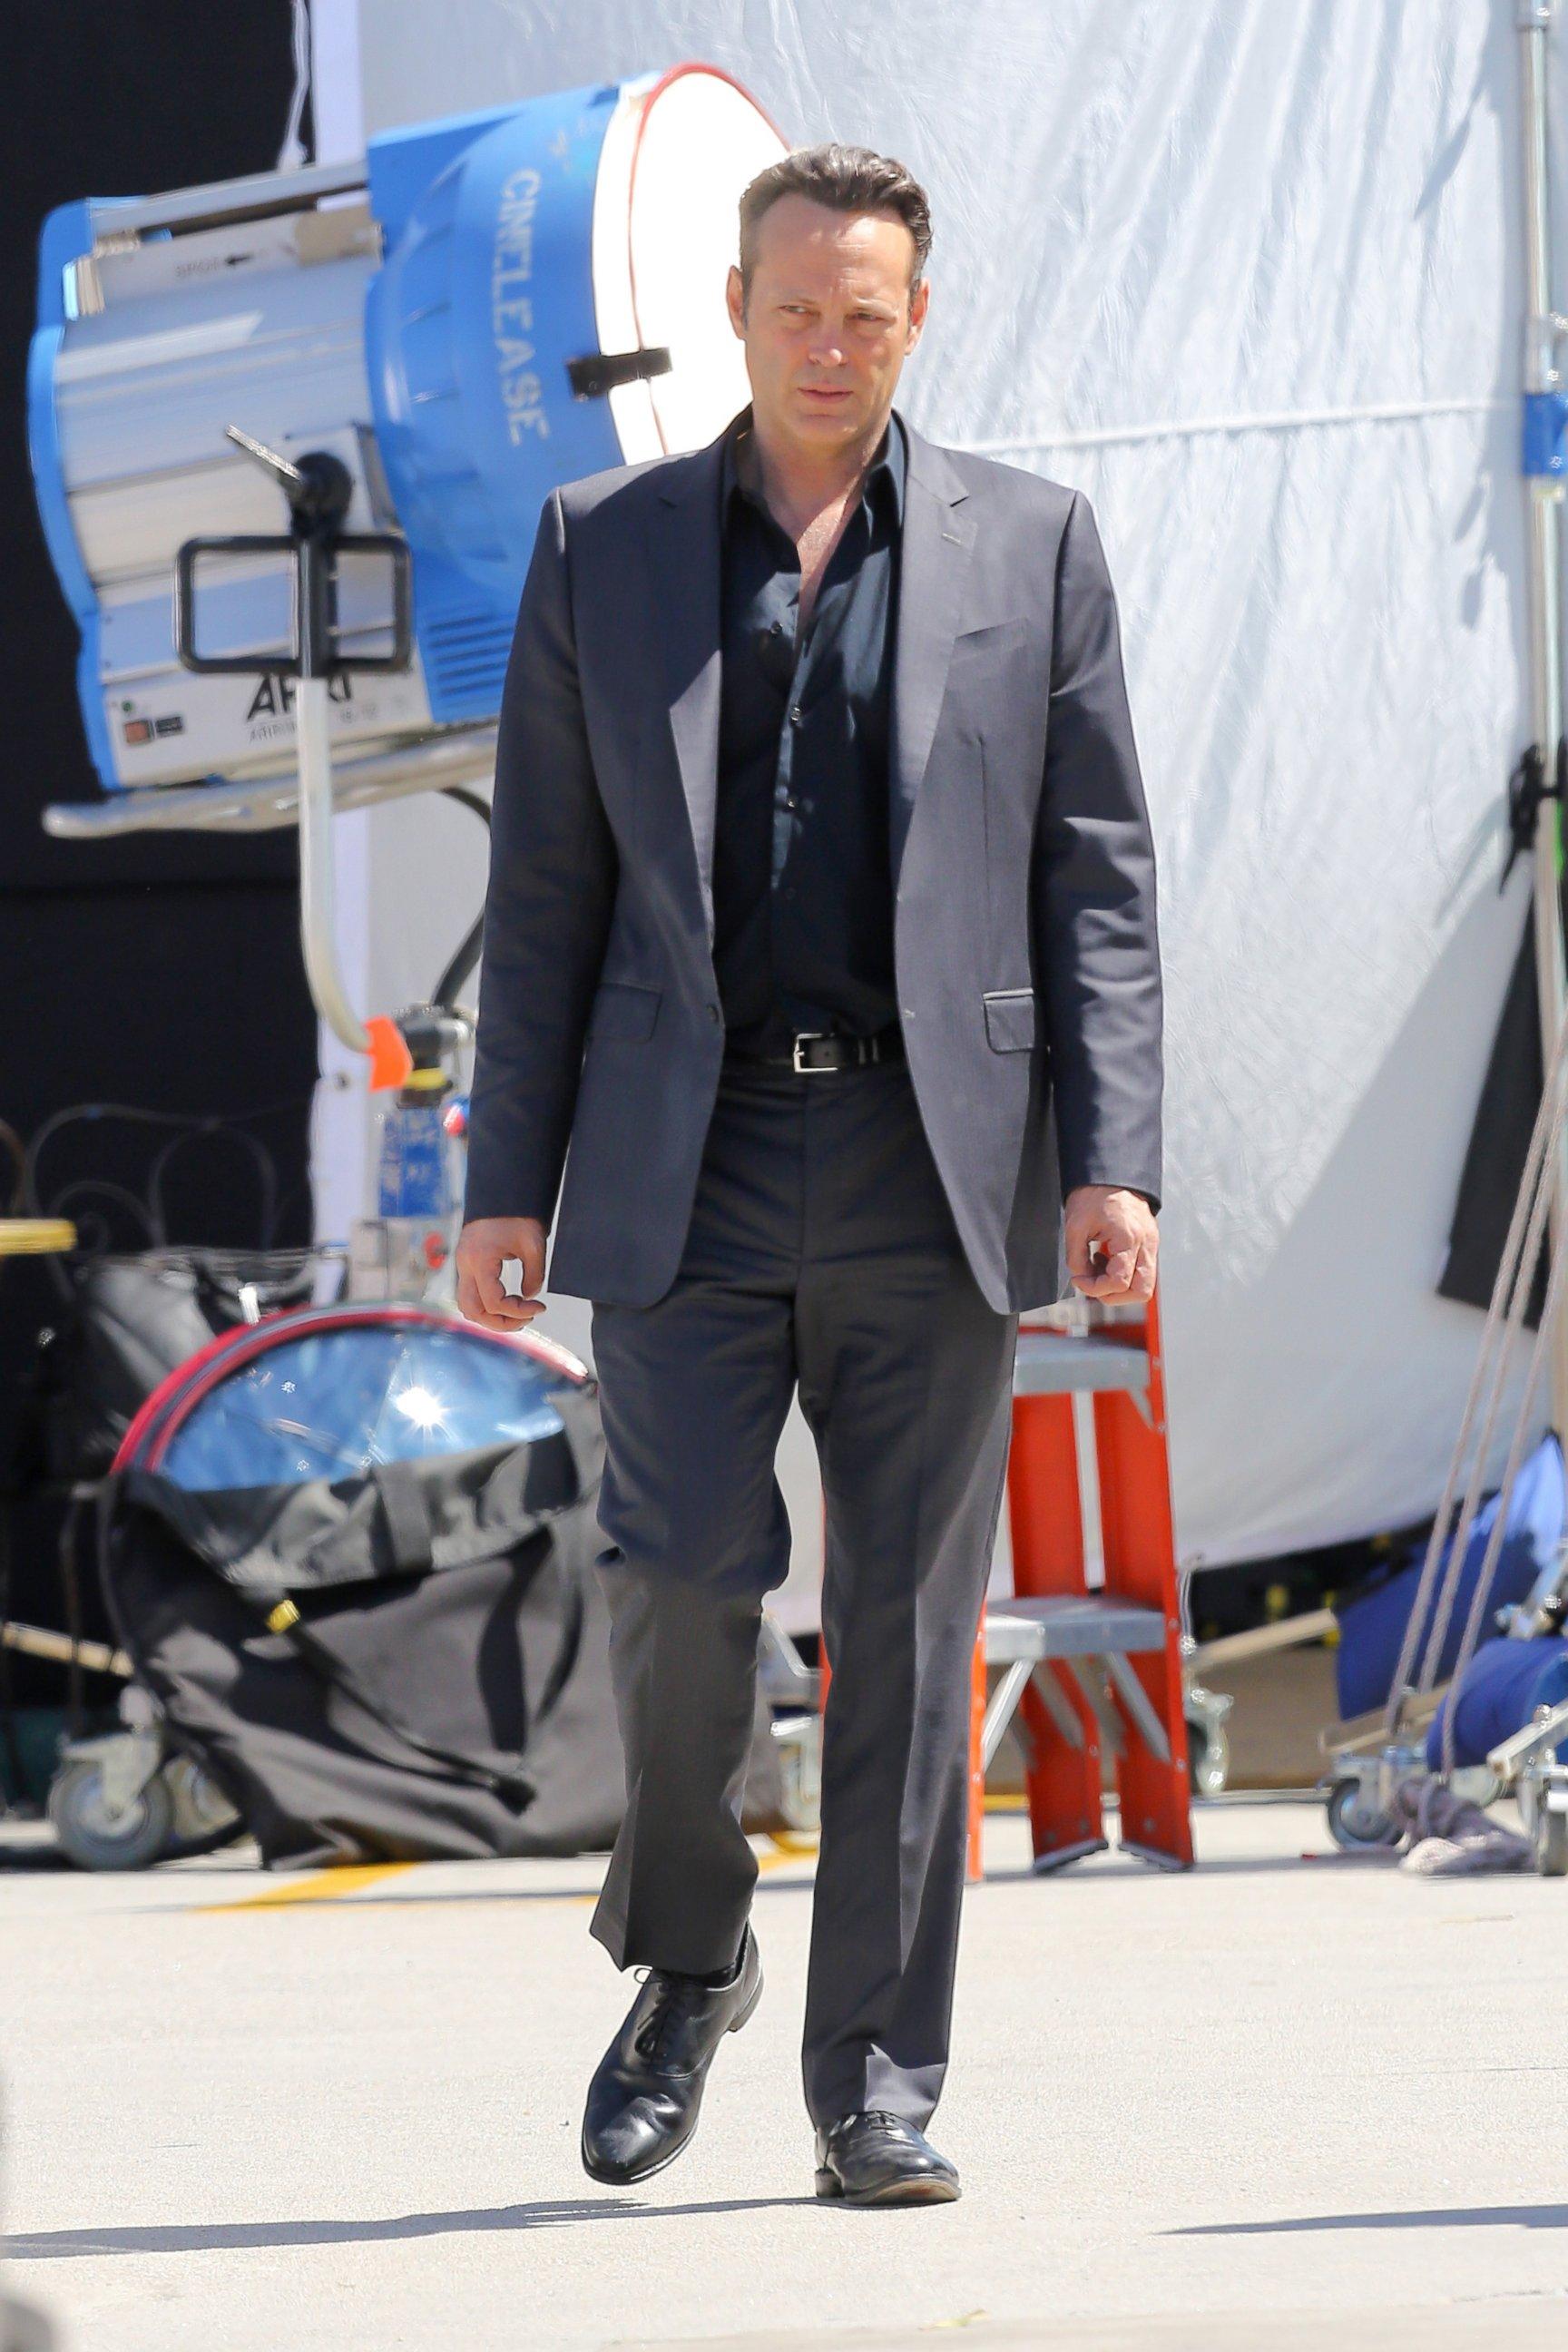 Vince Vaughn Gets to Work on True Detective